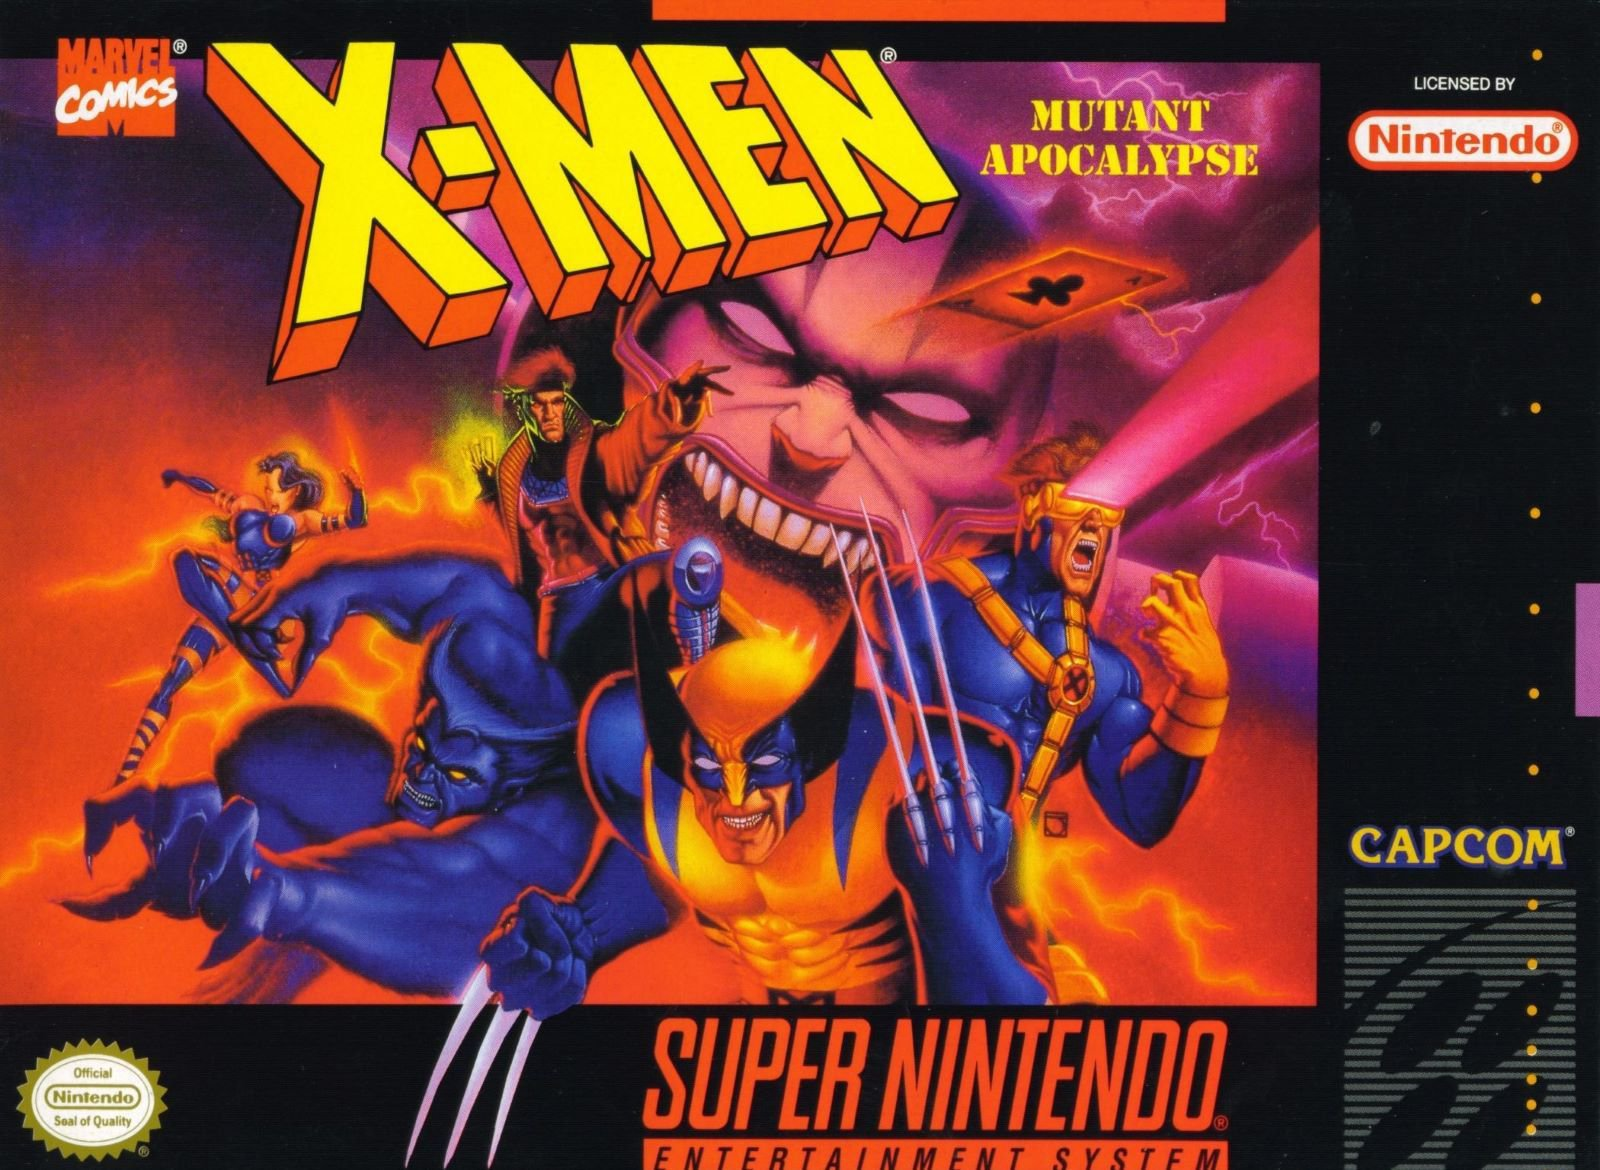 x-men mutant apocalypse7546477882706423122..jpg